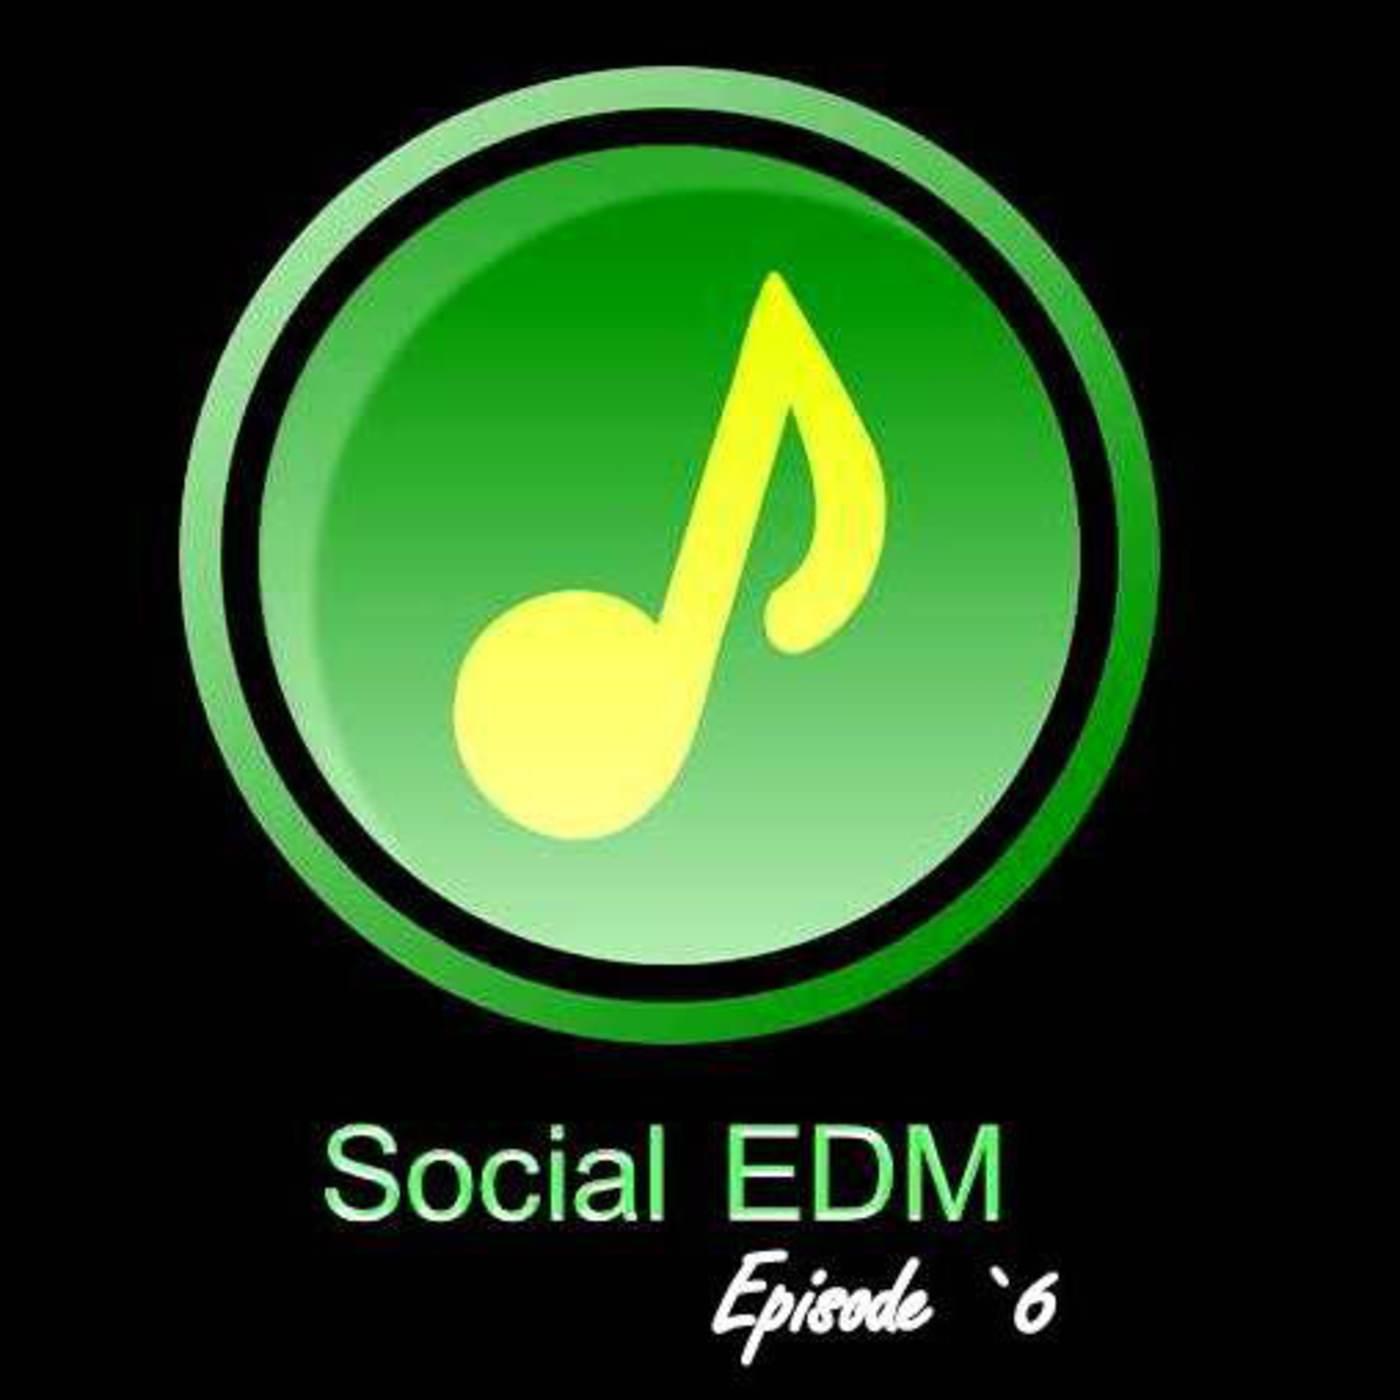 Koma Salazar - Social EDM Podcast